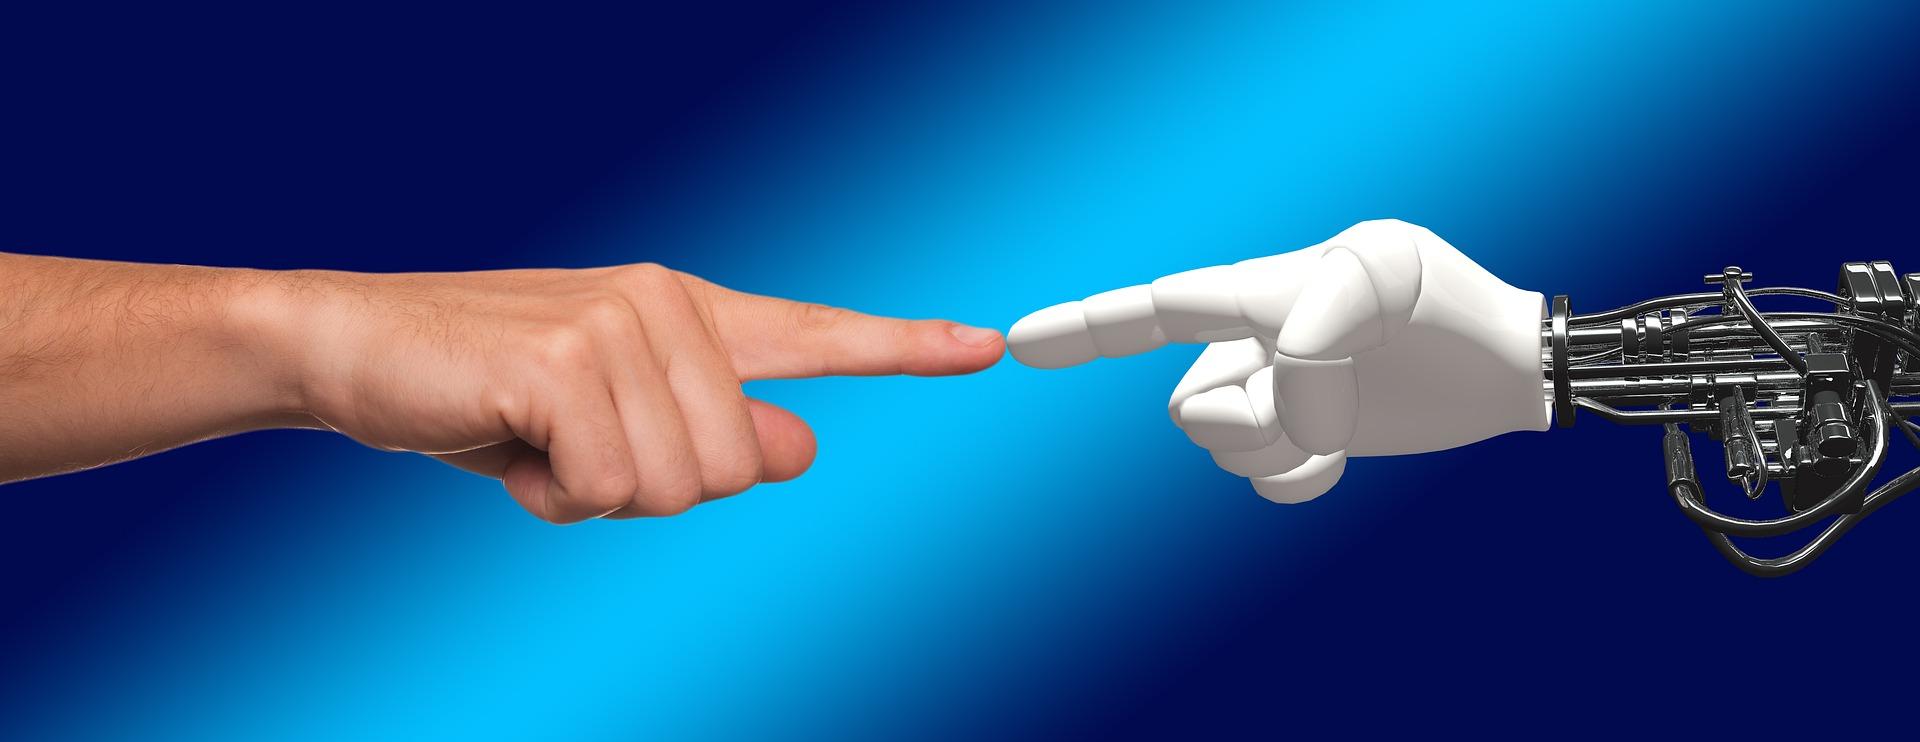 hand-roboterhand